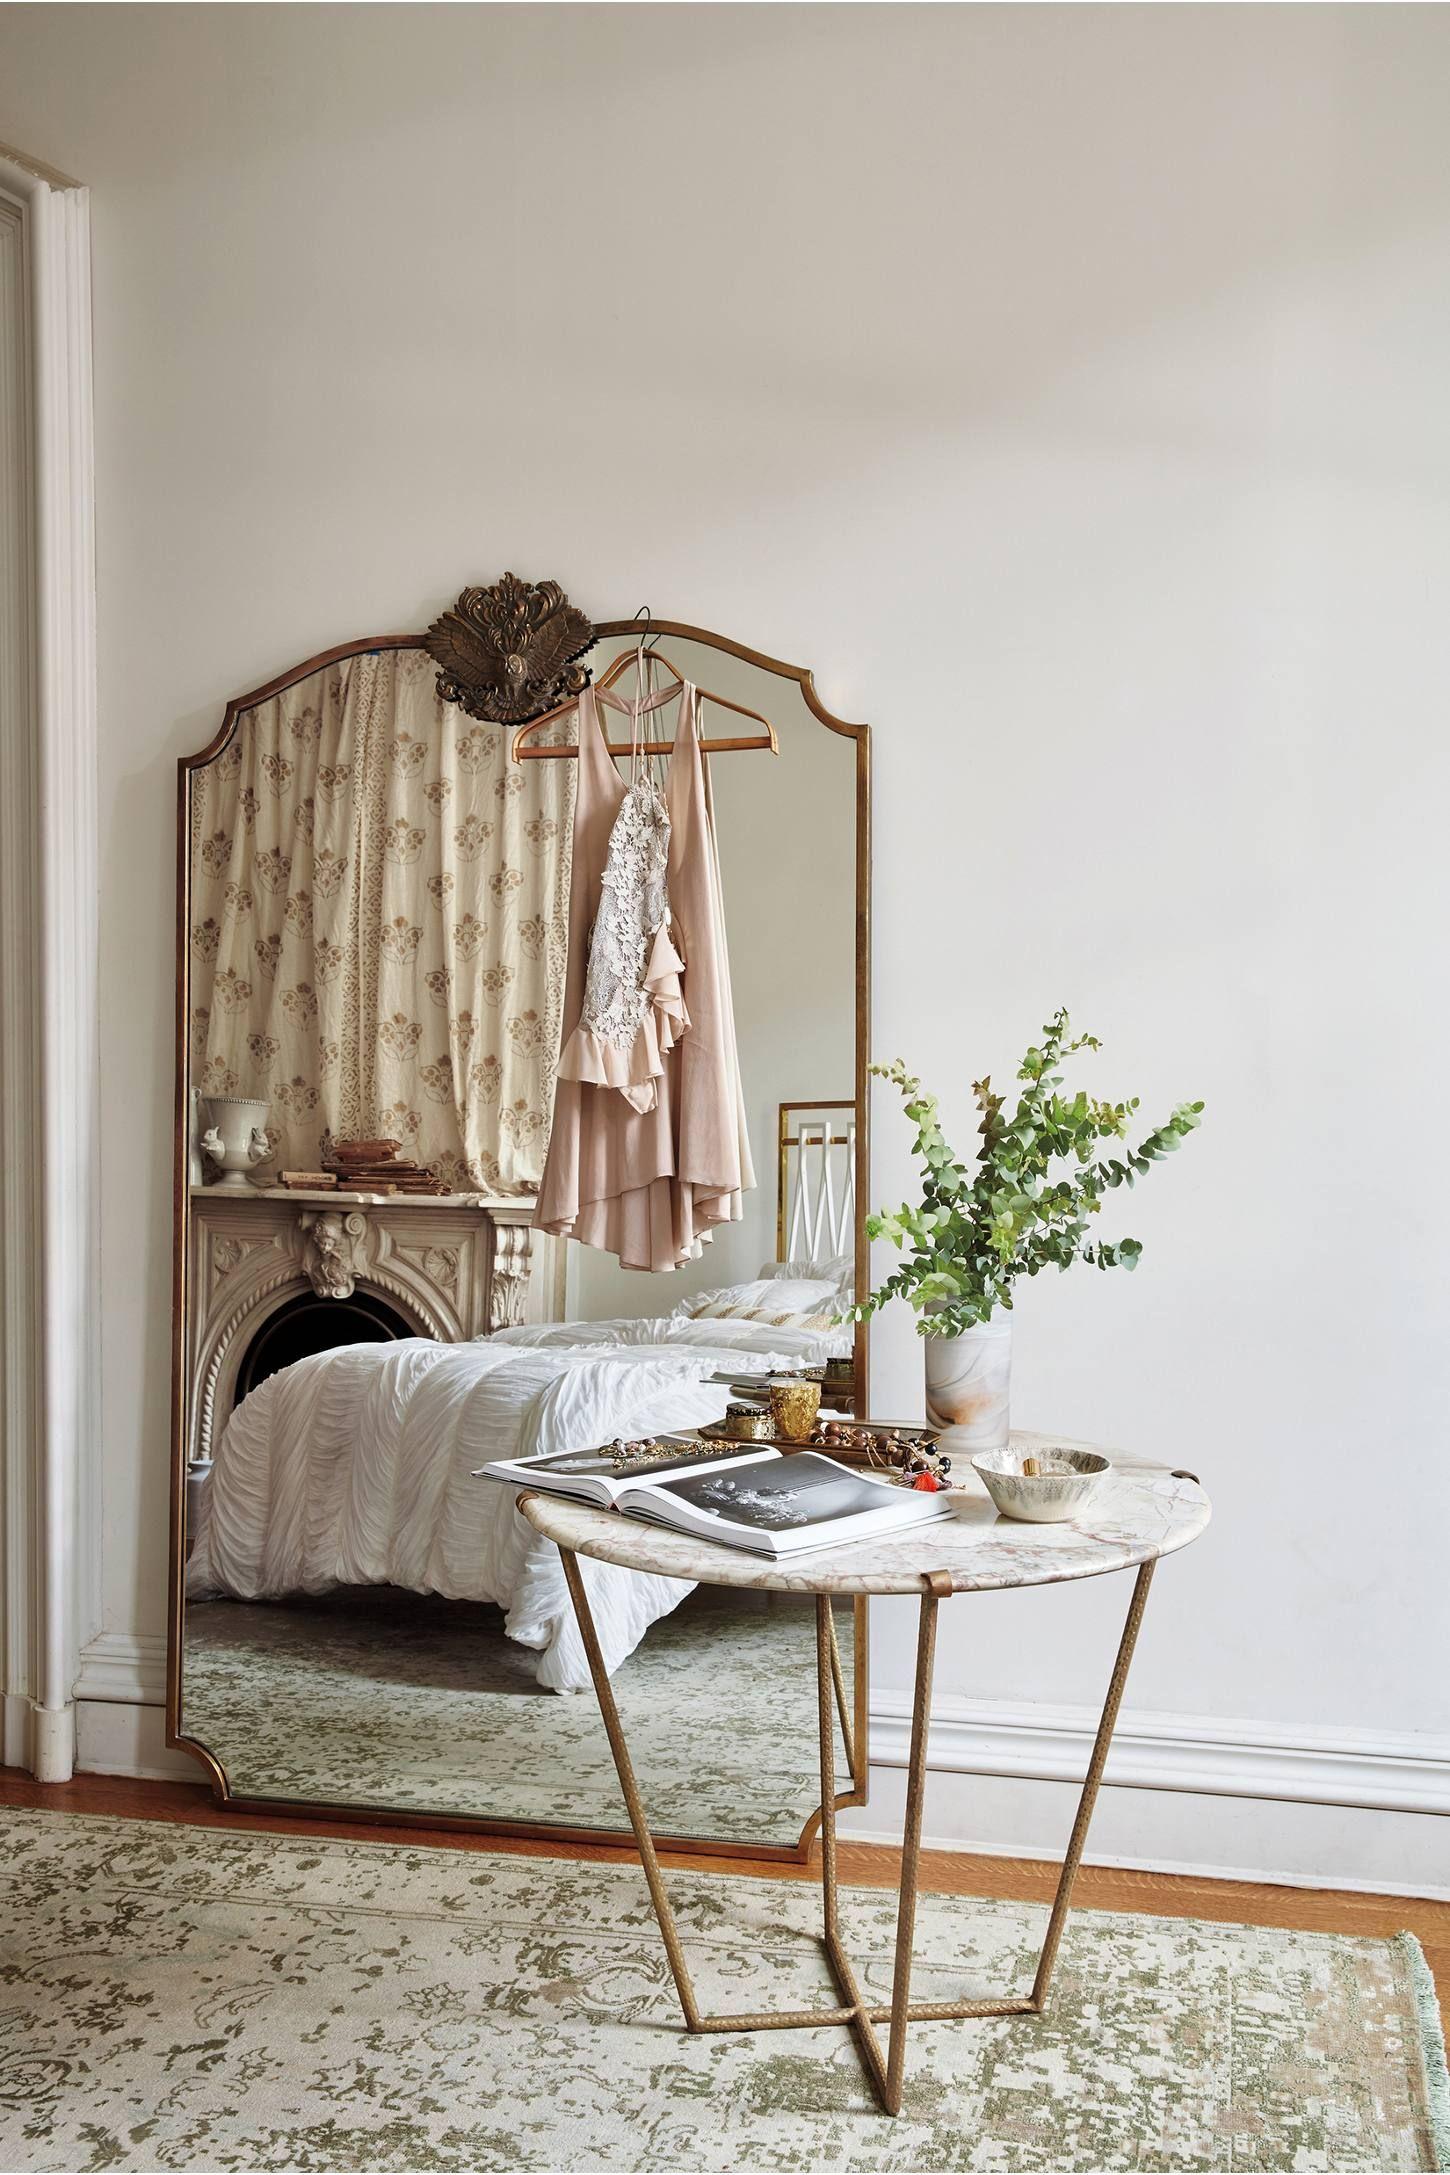 Wooded Manor Mirror -   25 unique home decor ideas